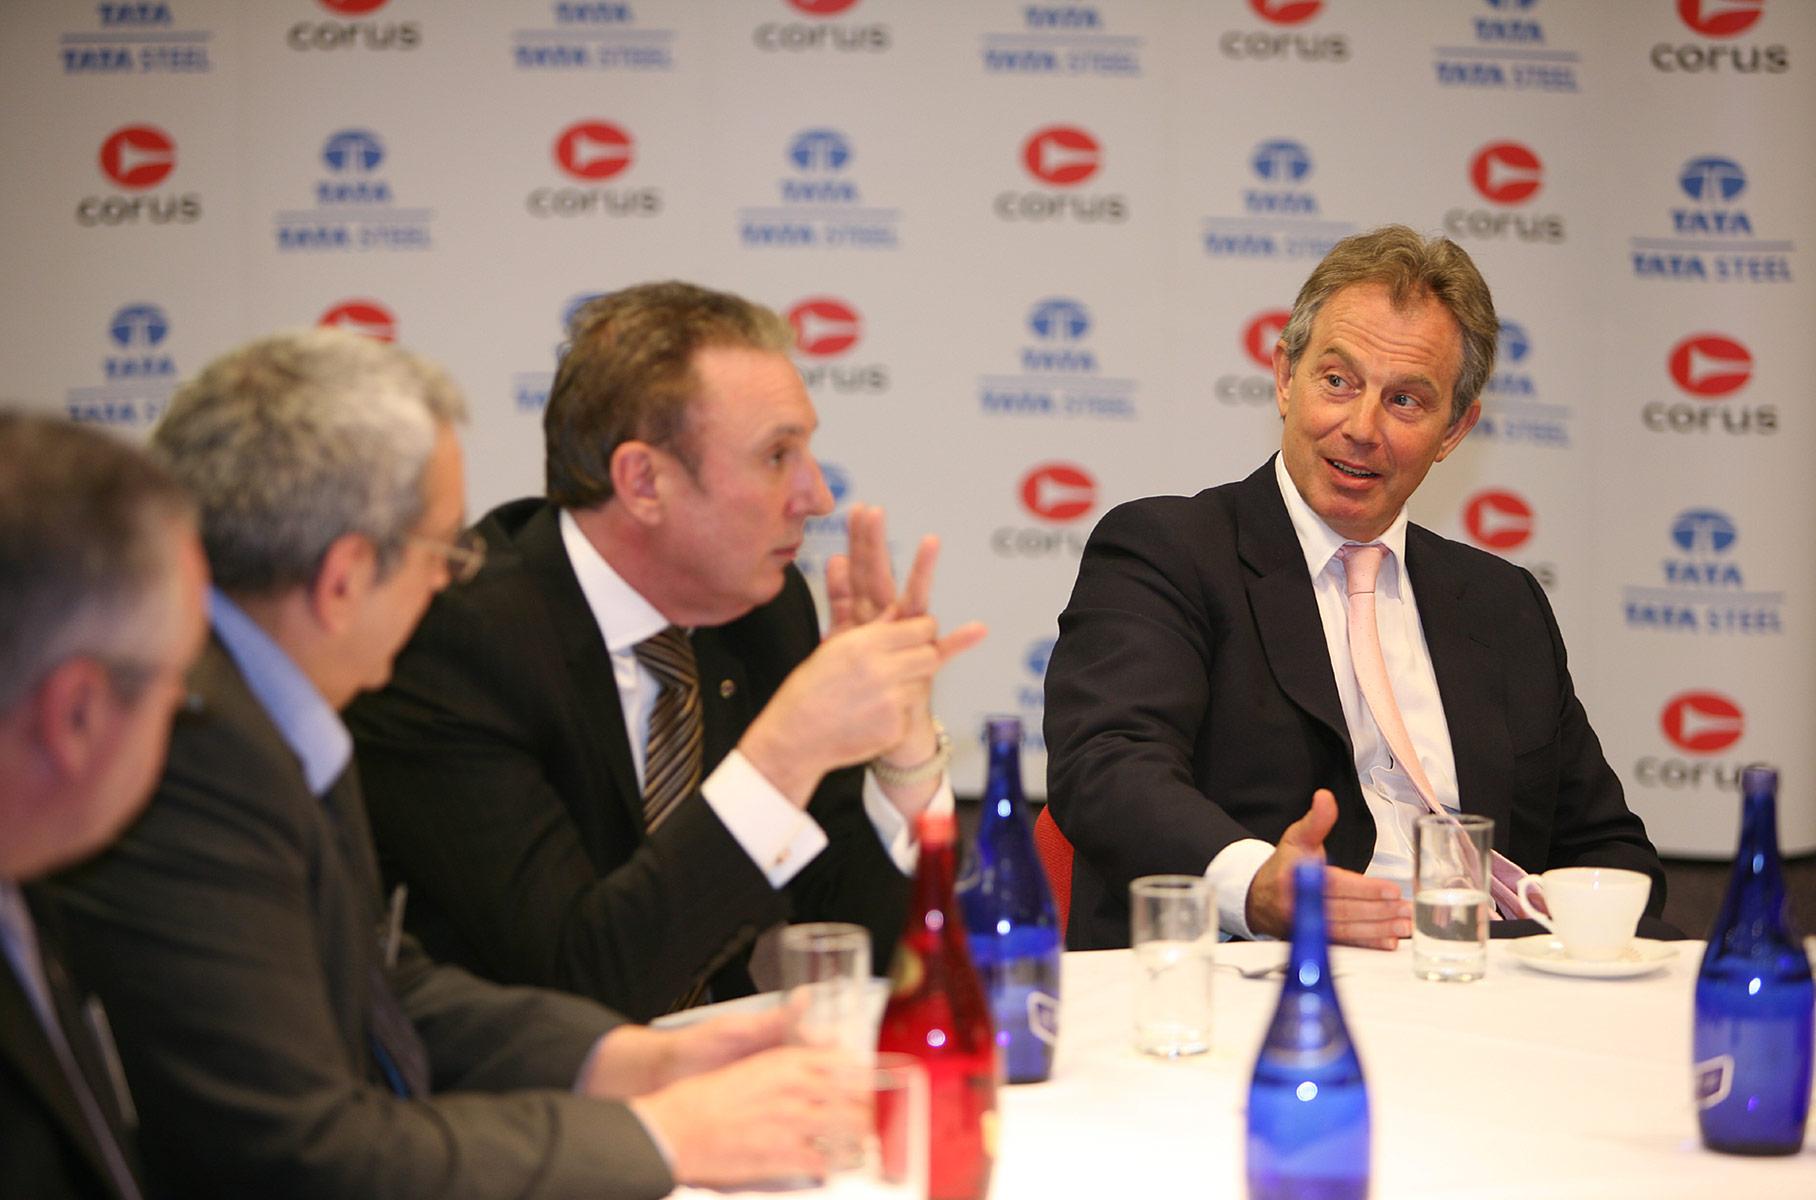 PM Tony Blair Site Visit / Tata / Corus Steel